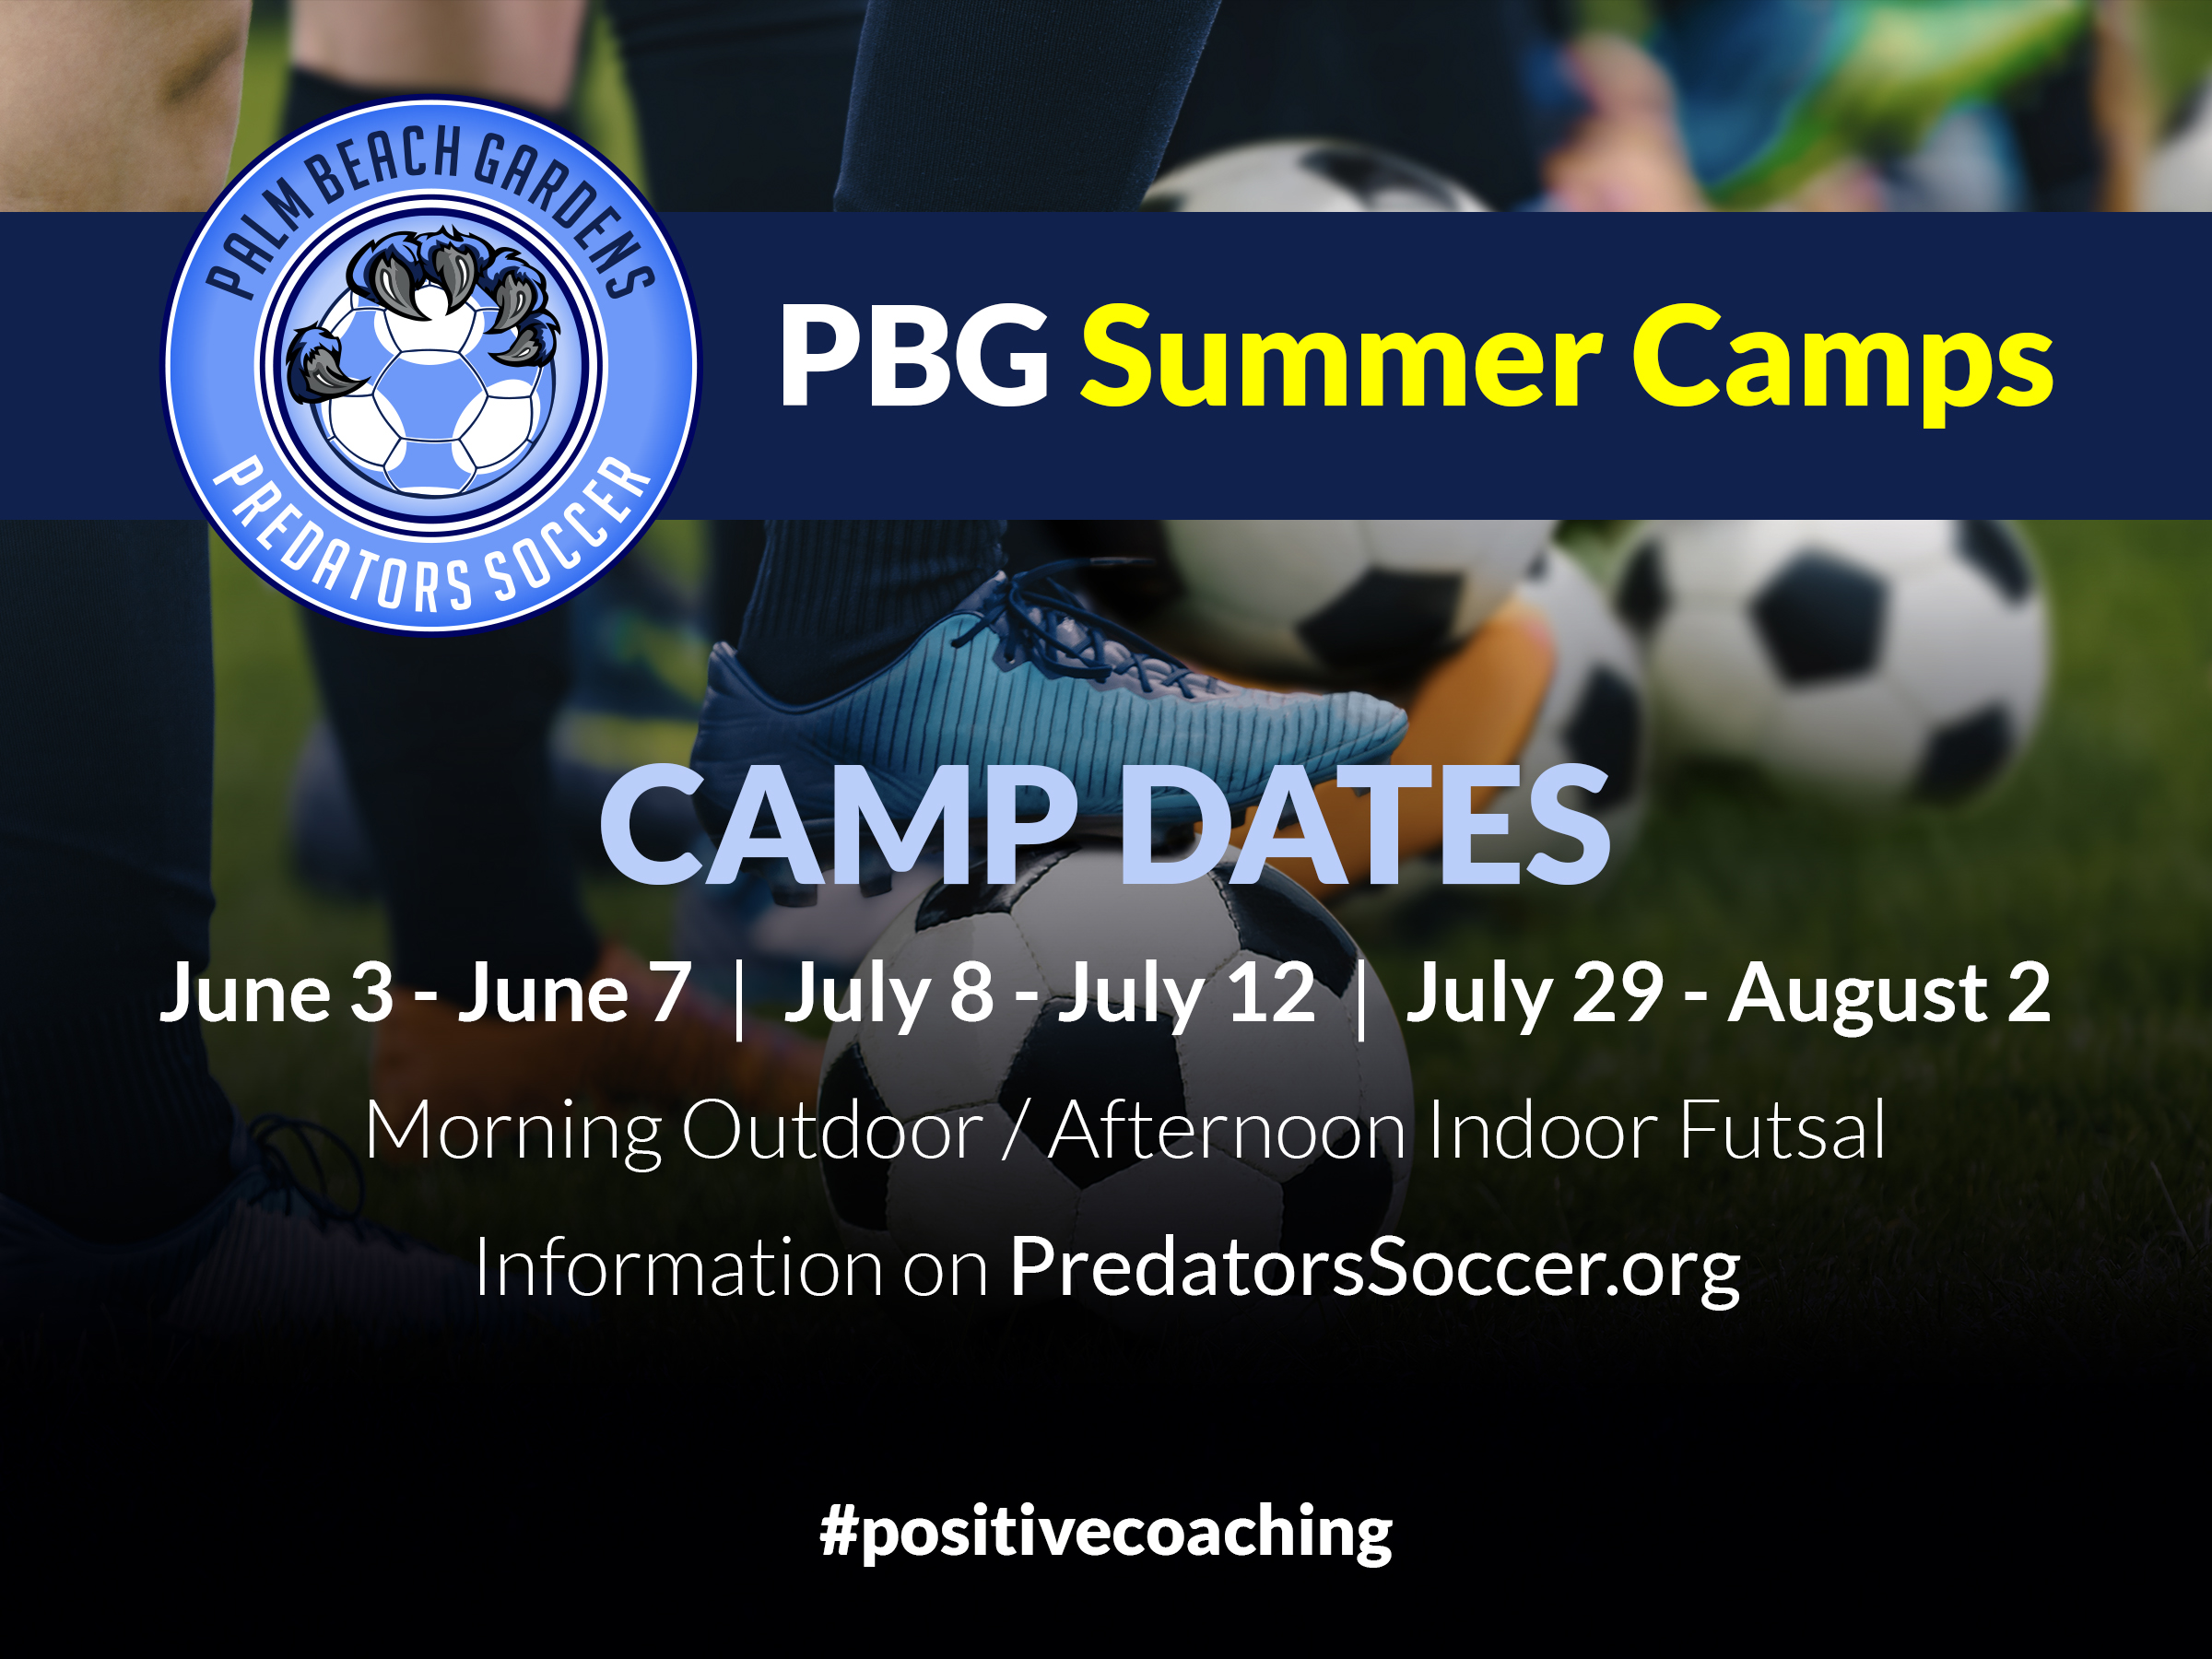 PBG Summer Camps